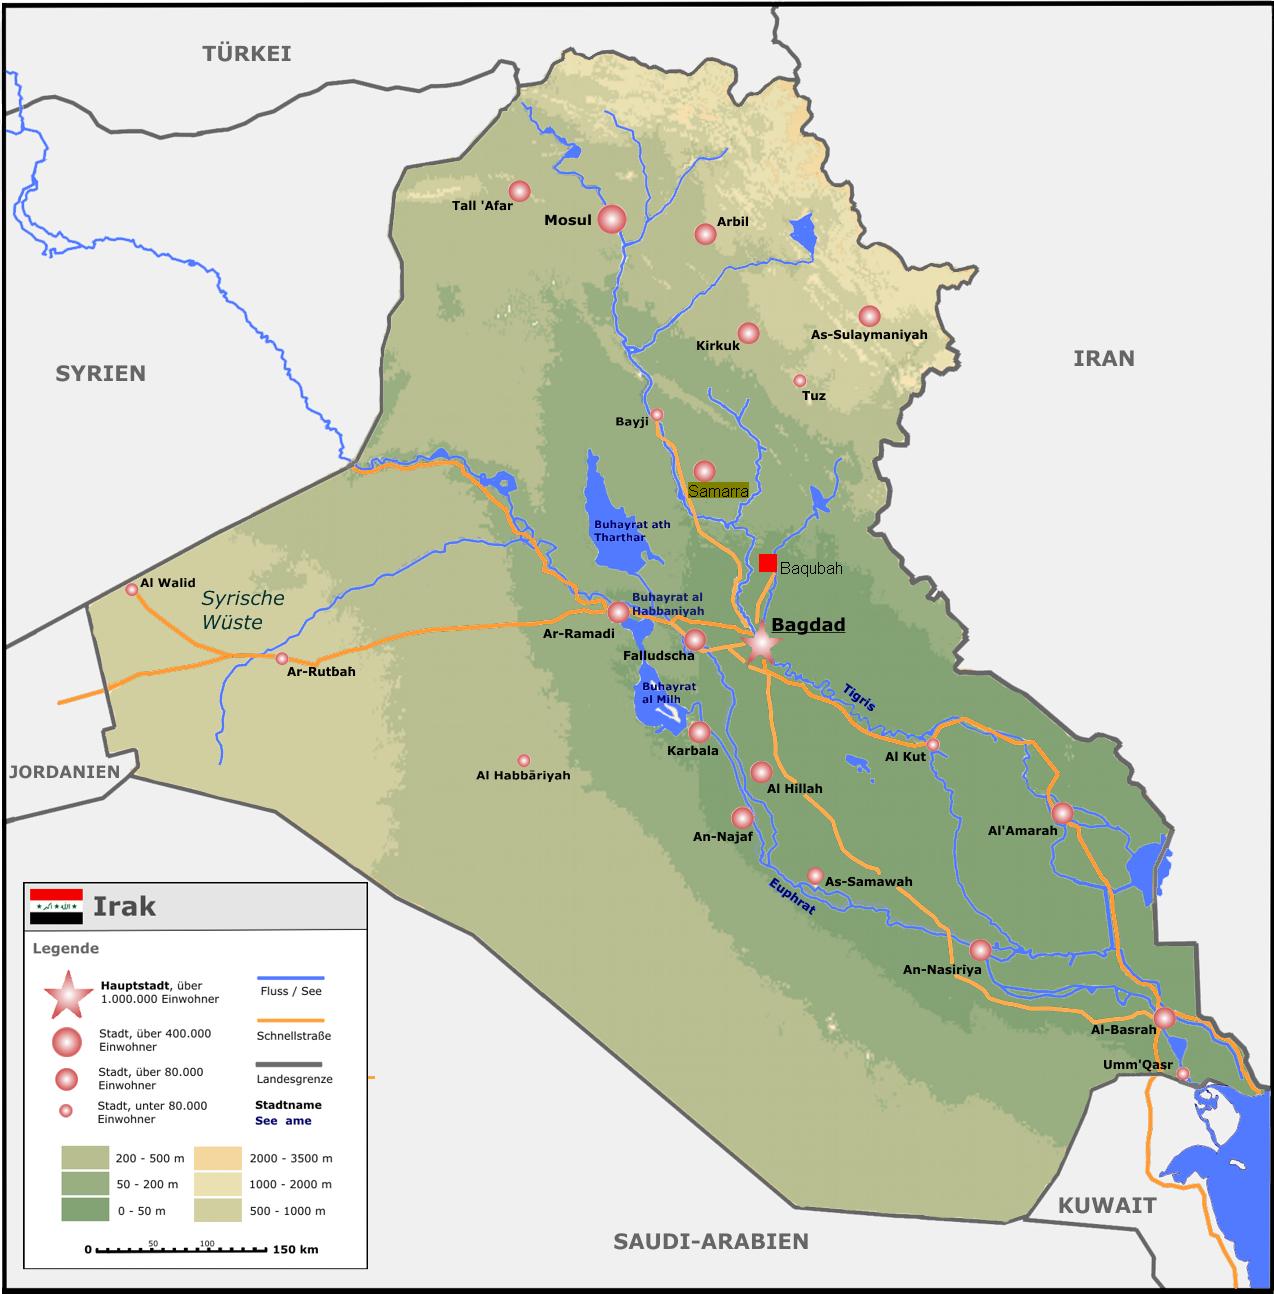 landkarte irak Landkarte Irak (Übersichtskarte) : Weltkarte.  Karten und  landkarte irak